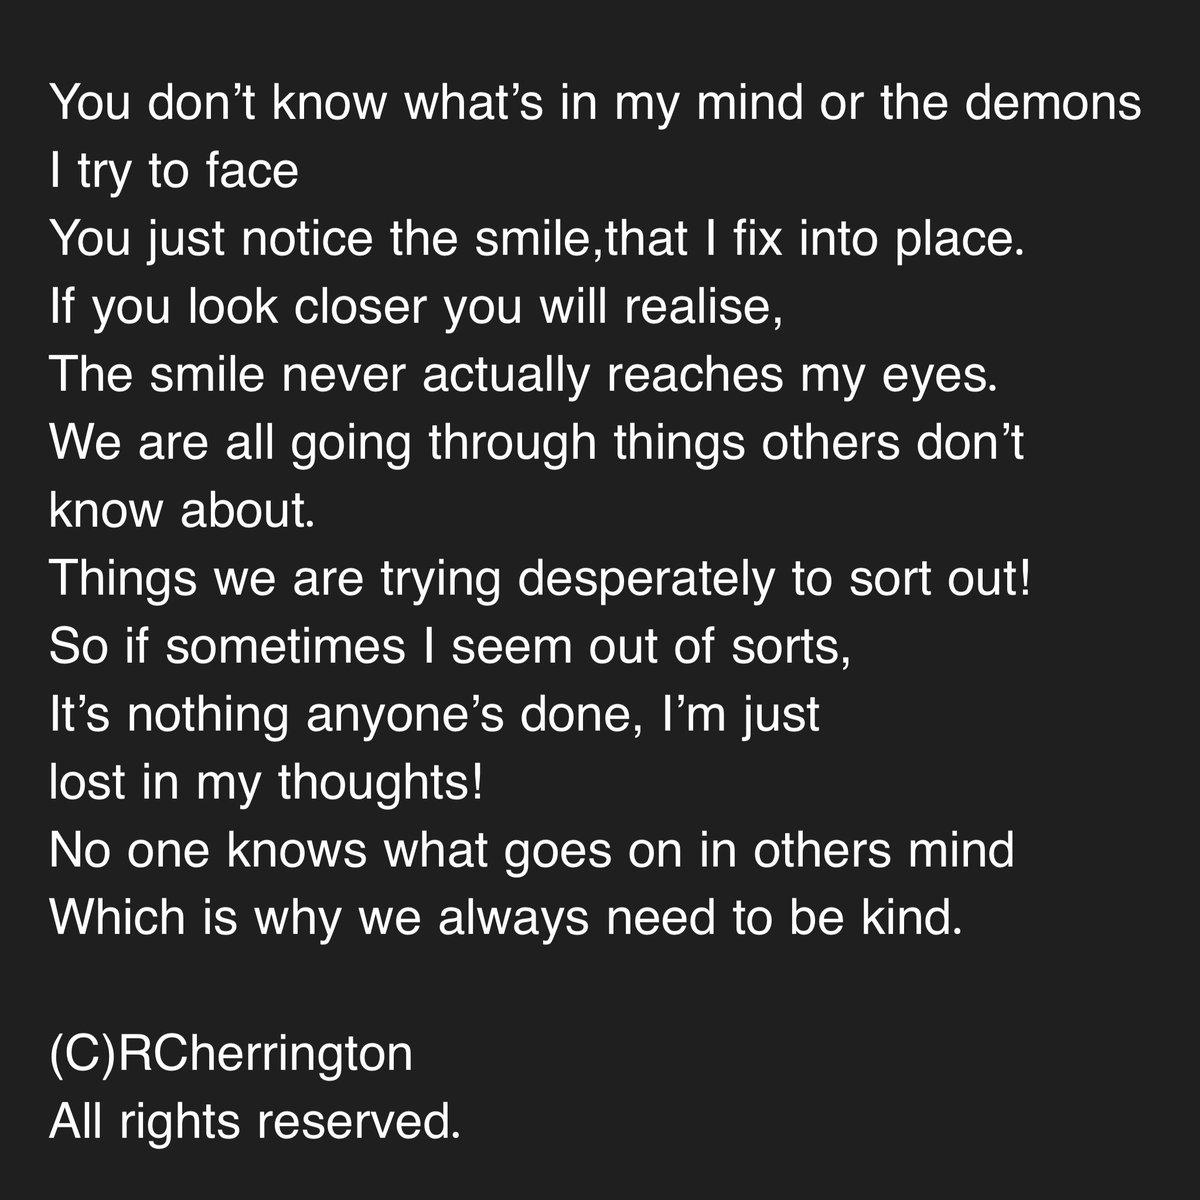 #poetsoftwitter #bekindalways #mentalhealthmatters https://t.co/34PeEQ0PKy